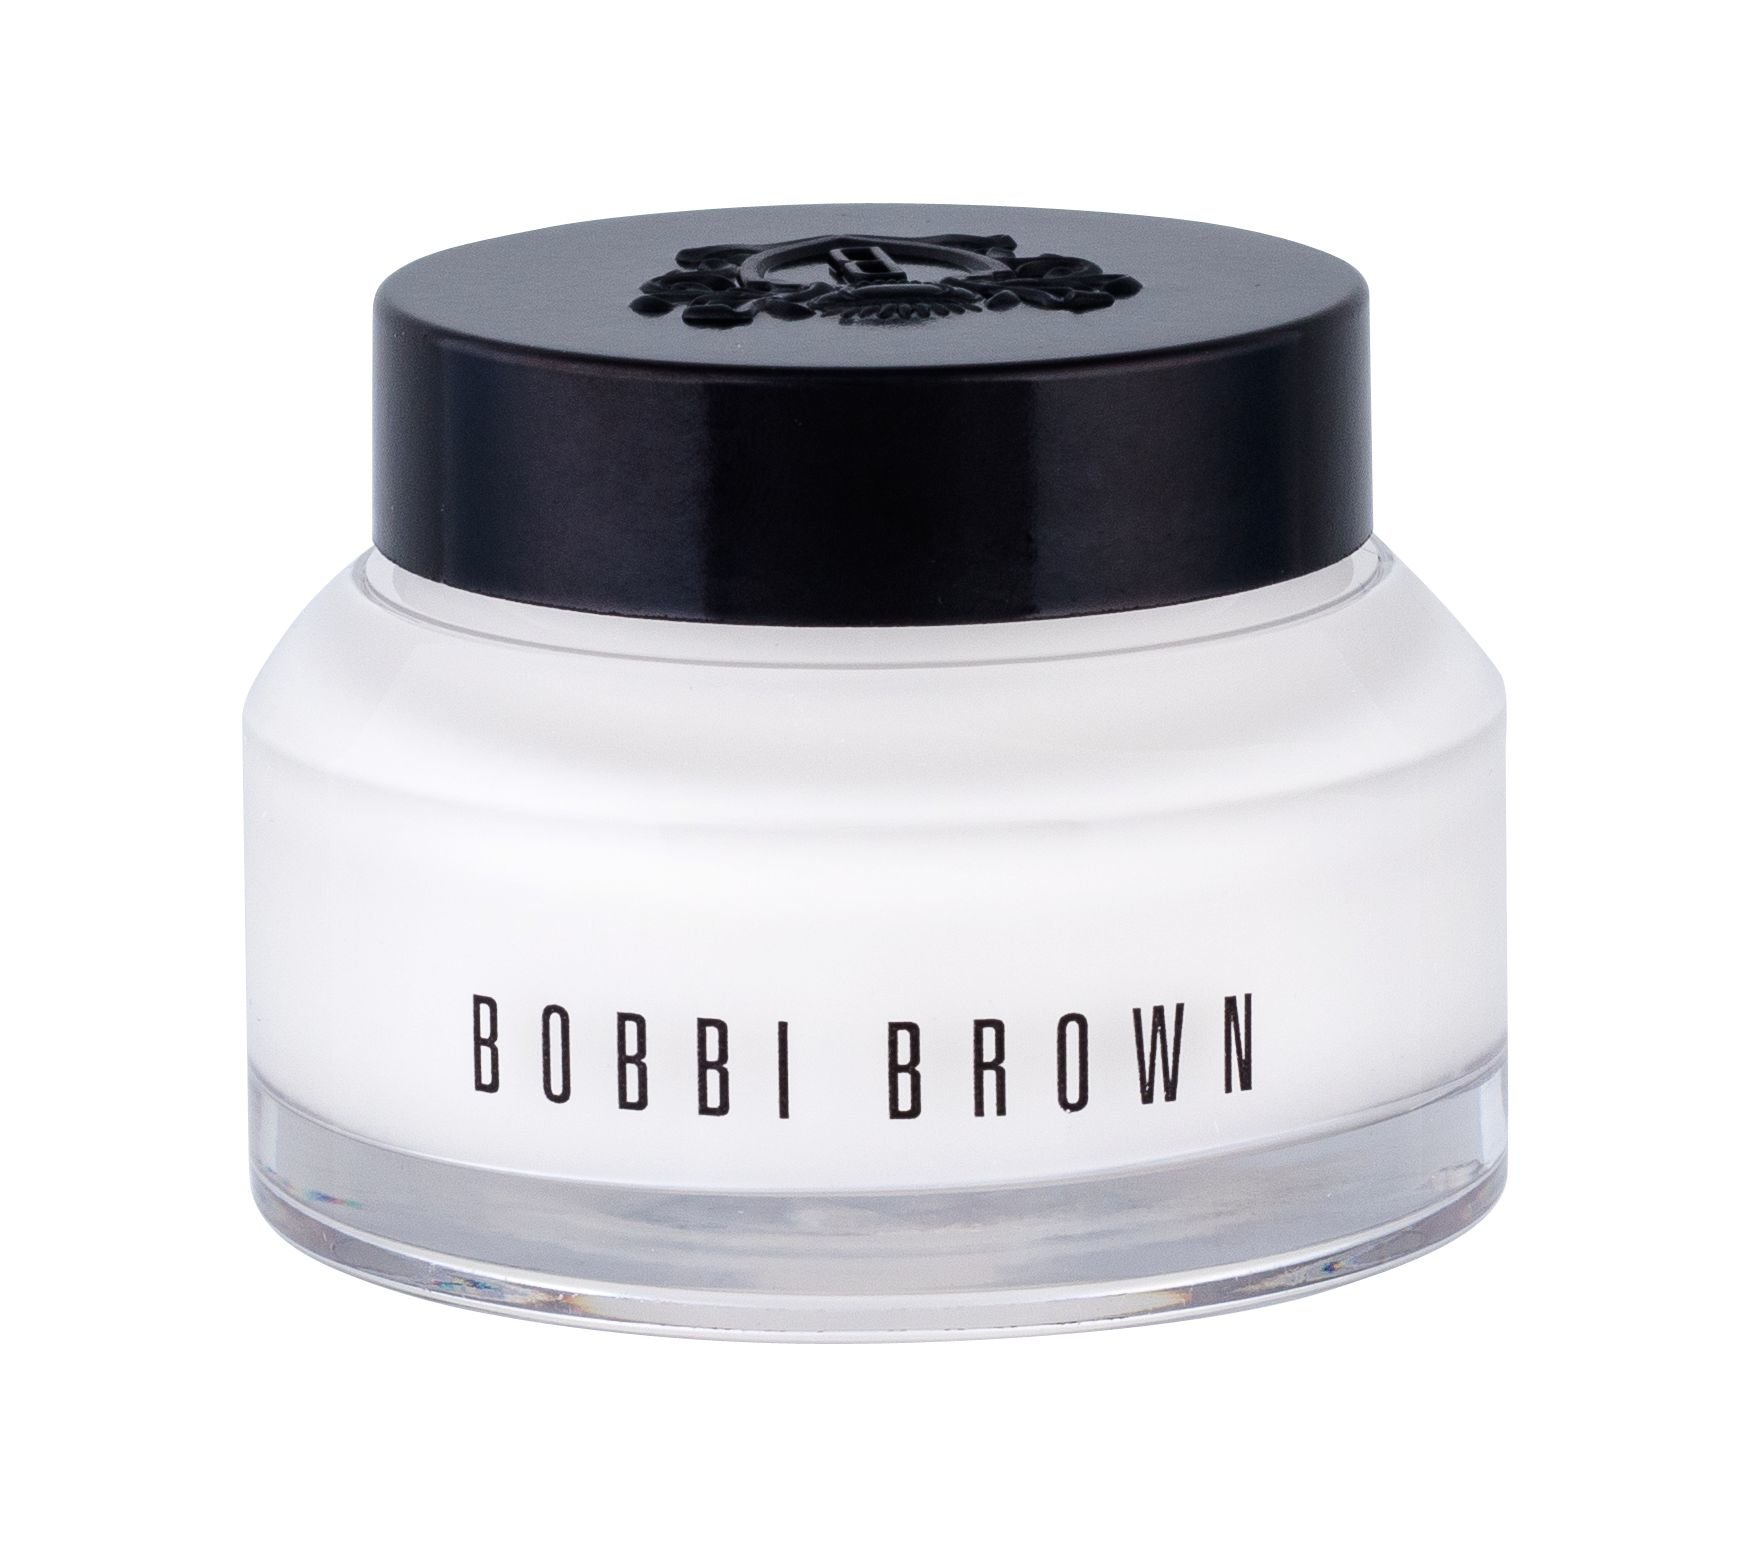 Bobbi Brown Hydrating Cosmetic 50ml  Face Cream